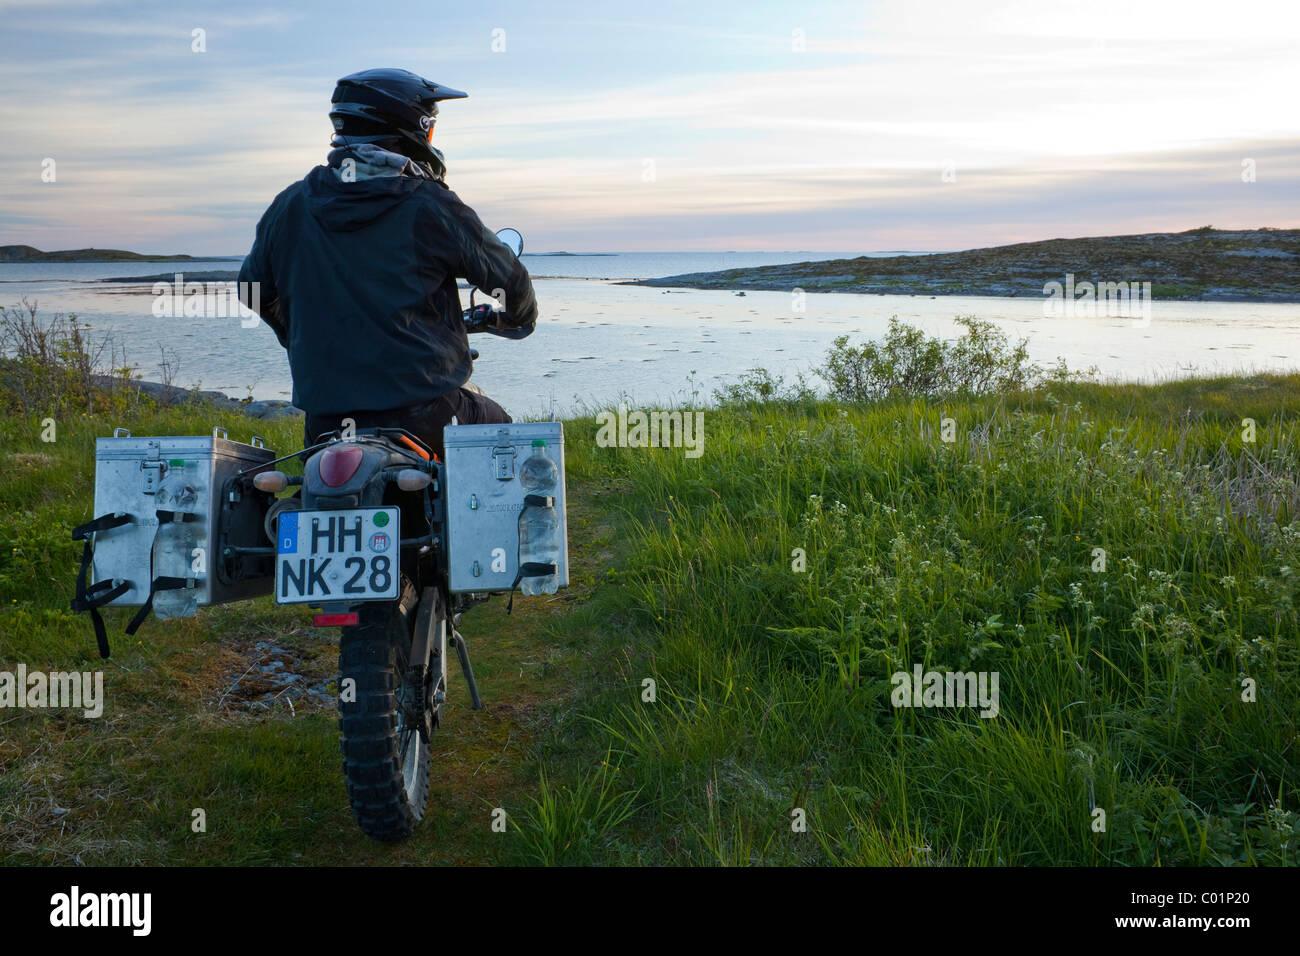 Man riding an Enduro motorcycle in the evening twilight, Gimsefjorde, Norway, Scandinavia, Europe Stock Photo